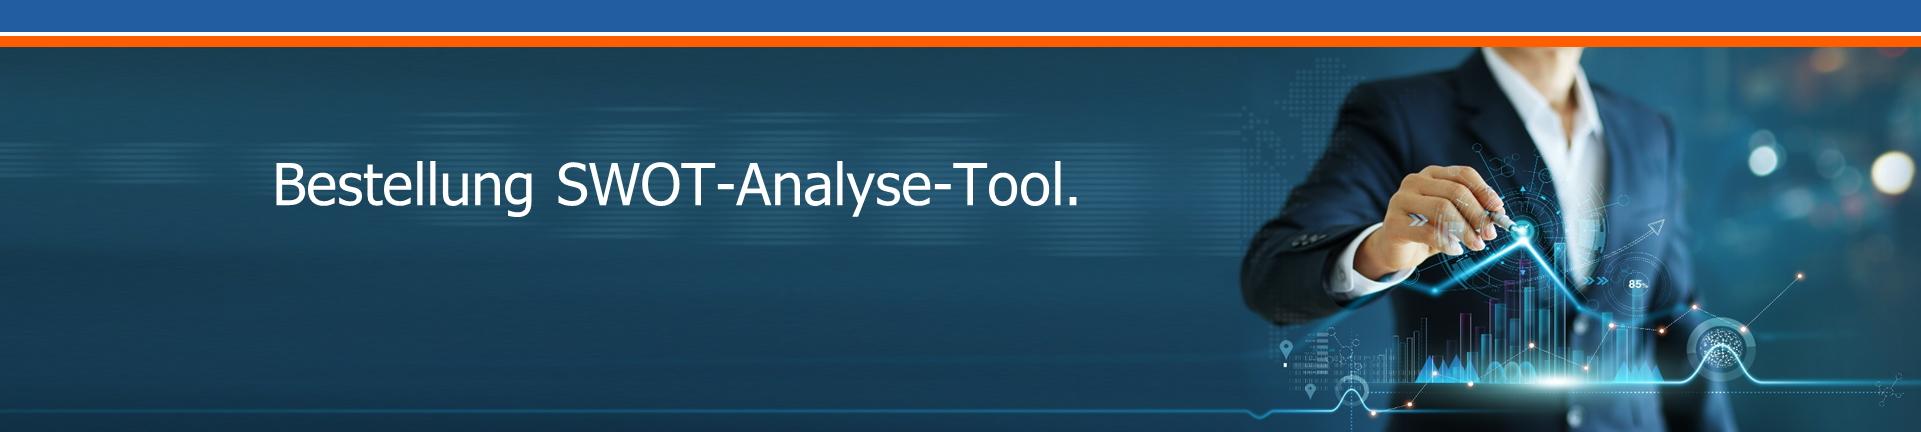 header-bestellung-swot-analyse-tool